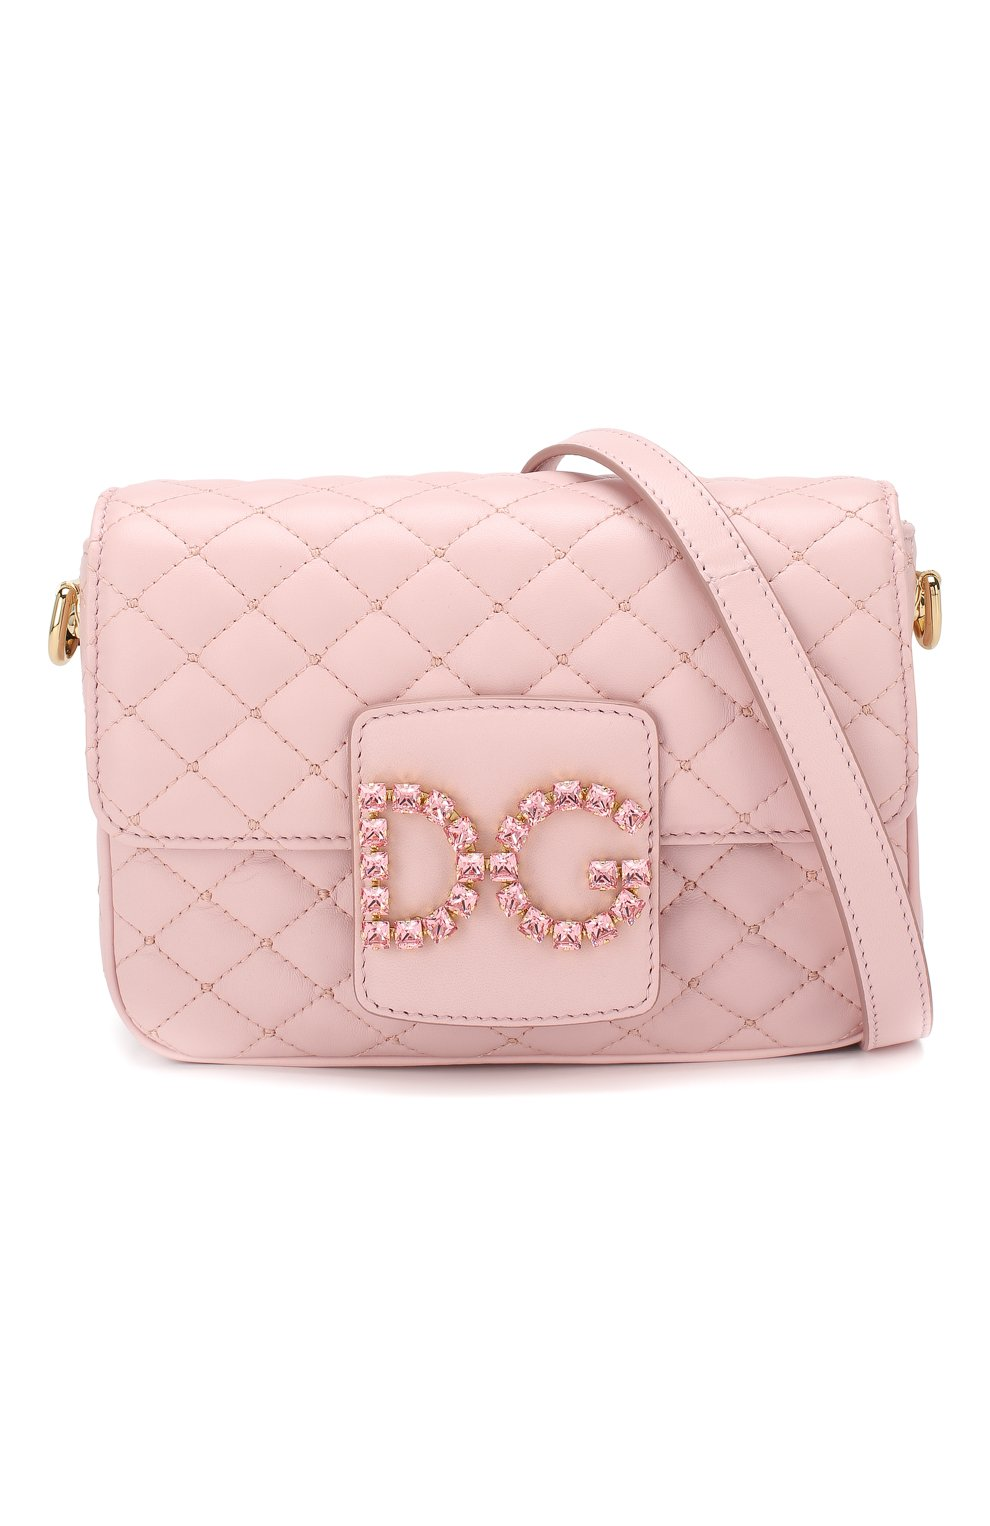 Сумка DG Millennials Dolce & Gabbana светло-розовая цвета   Фото №6